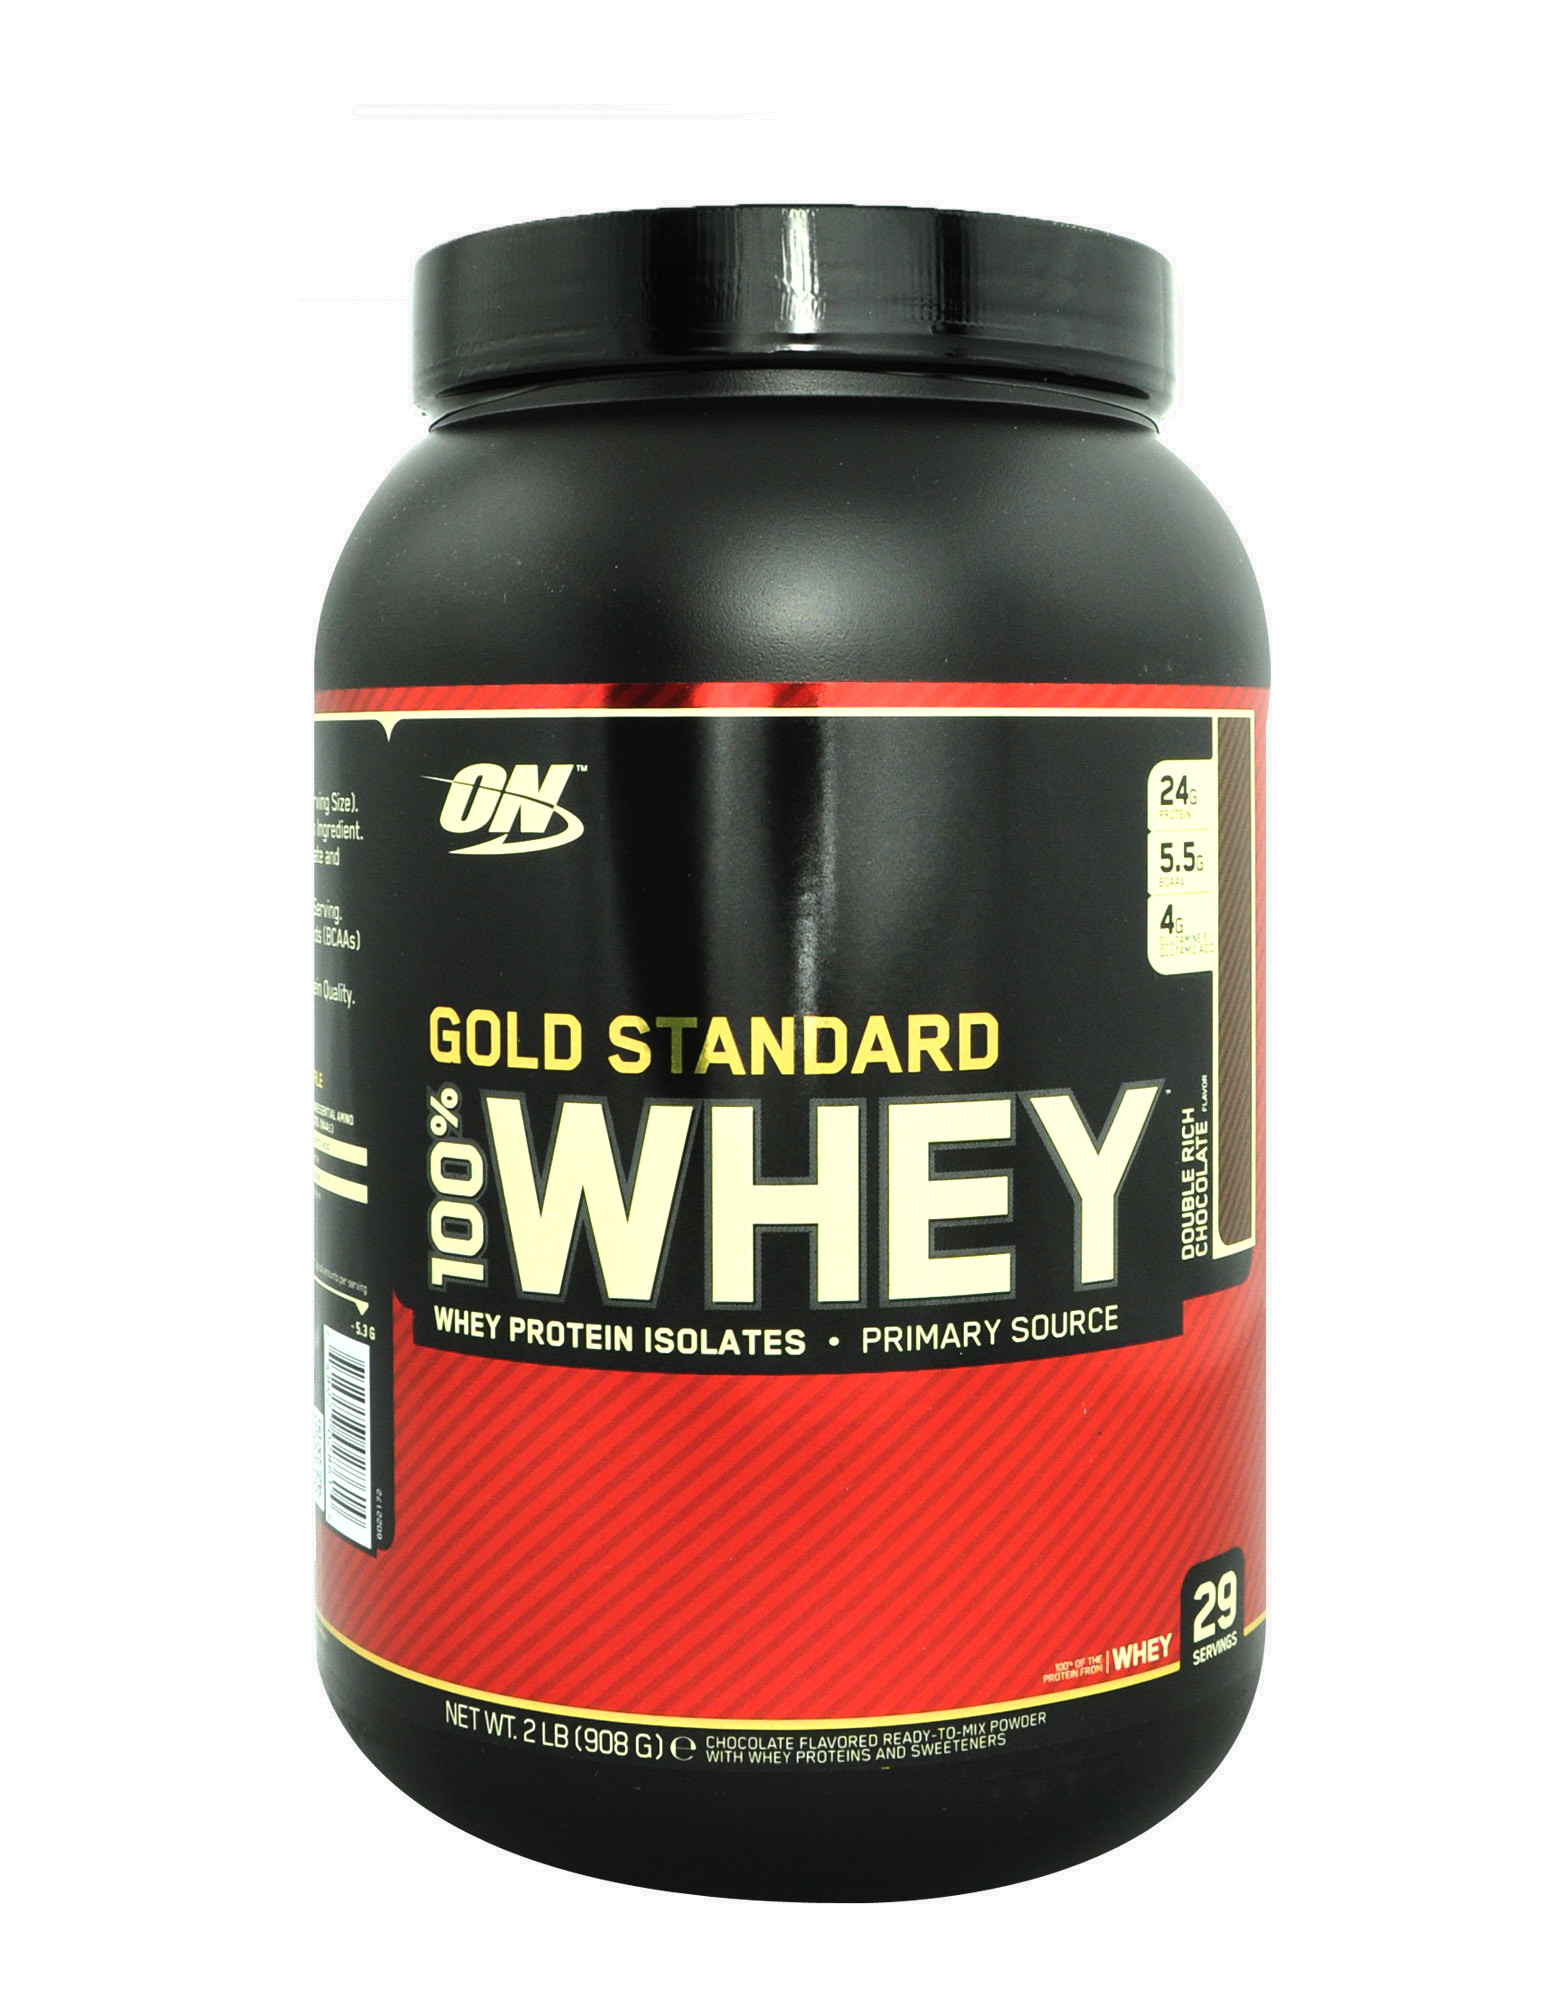 como tomar la proteina 100 whey gold standard